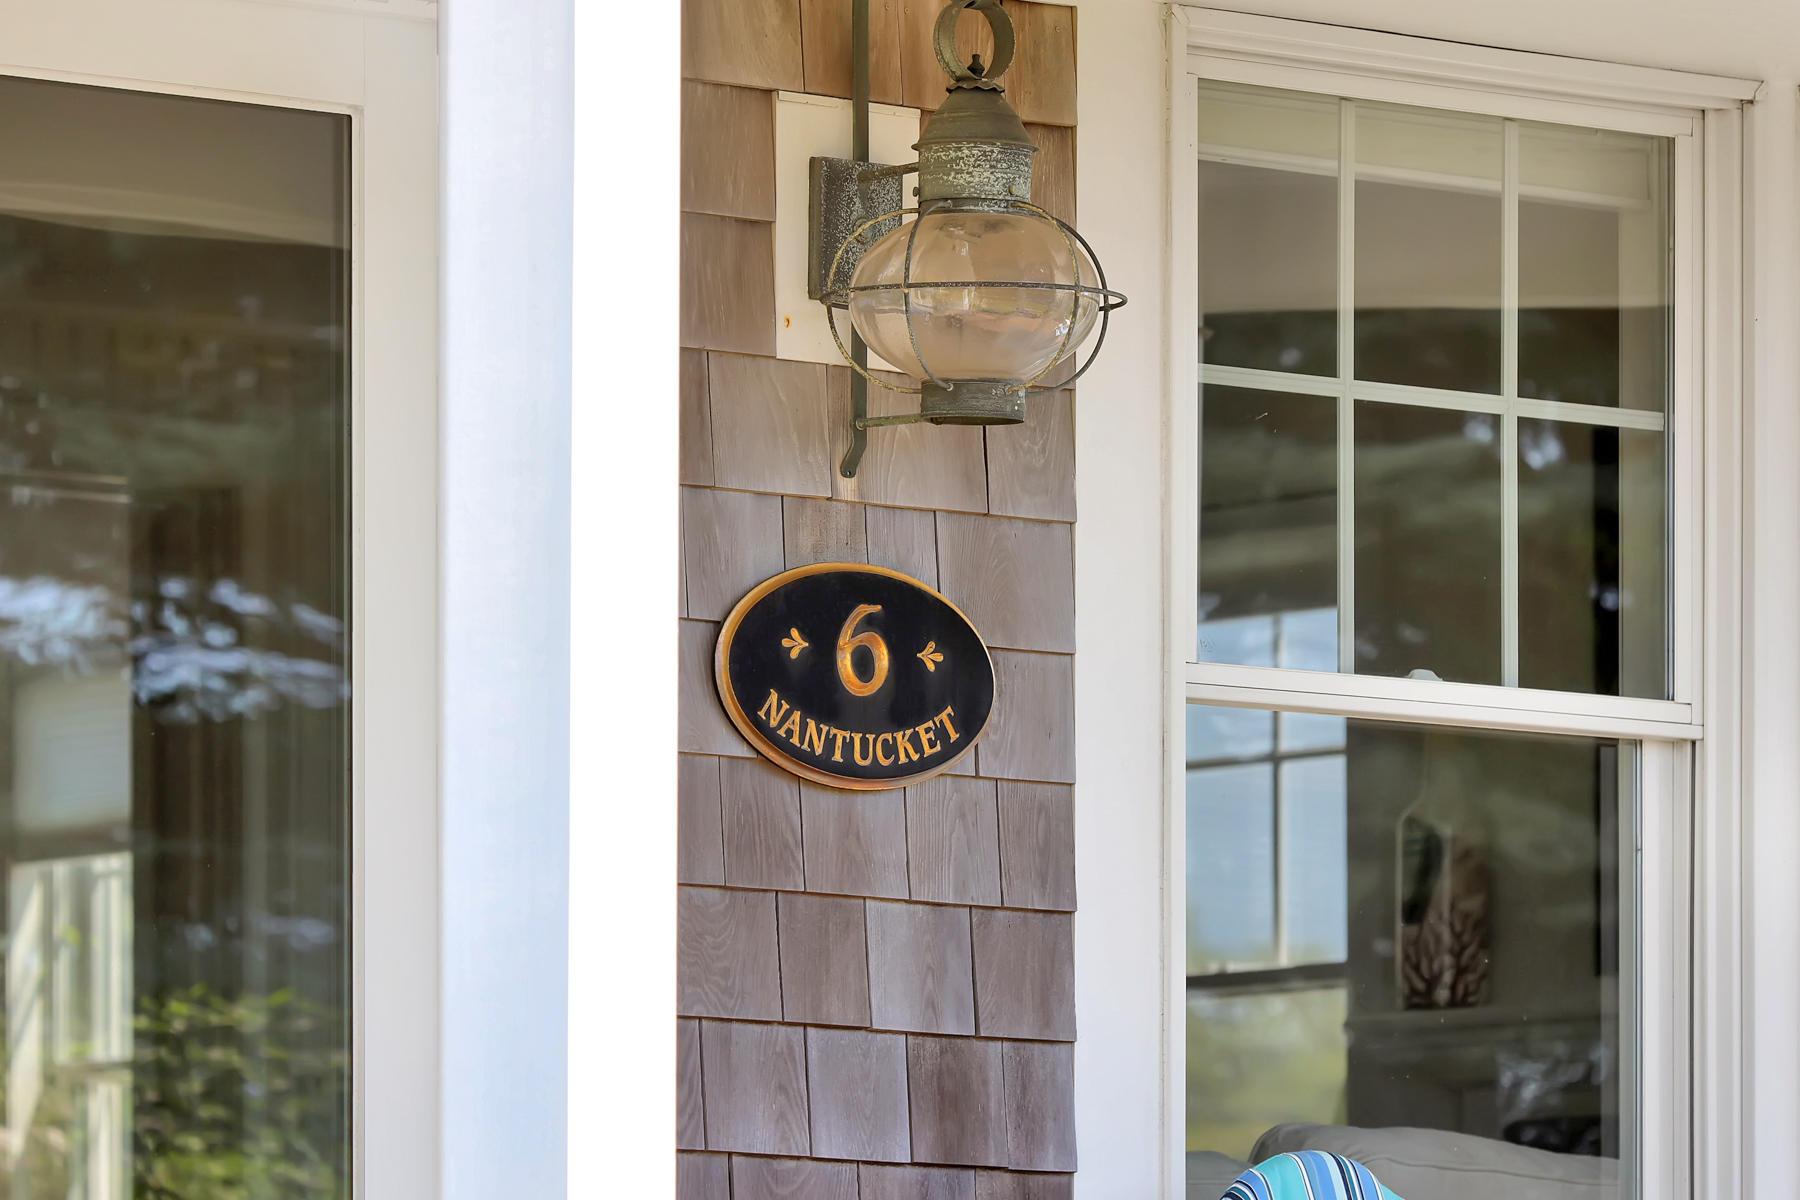 photo 3 6 Nantucket Drive, Chatham MA, 02633